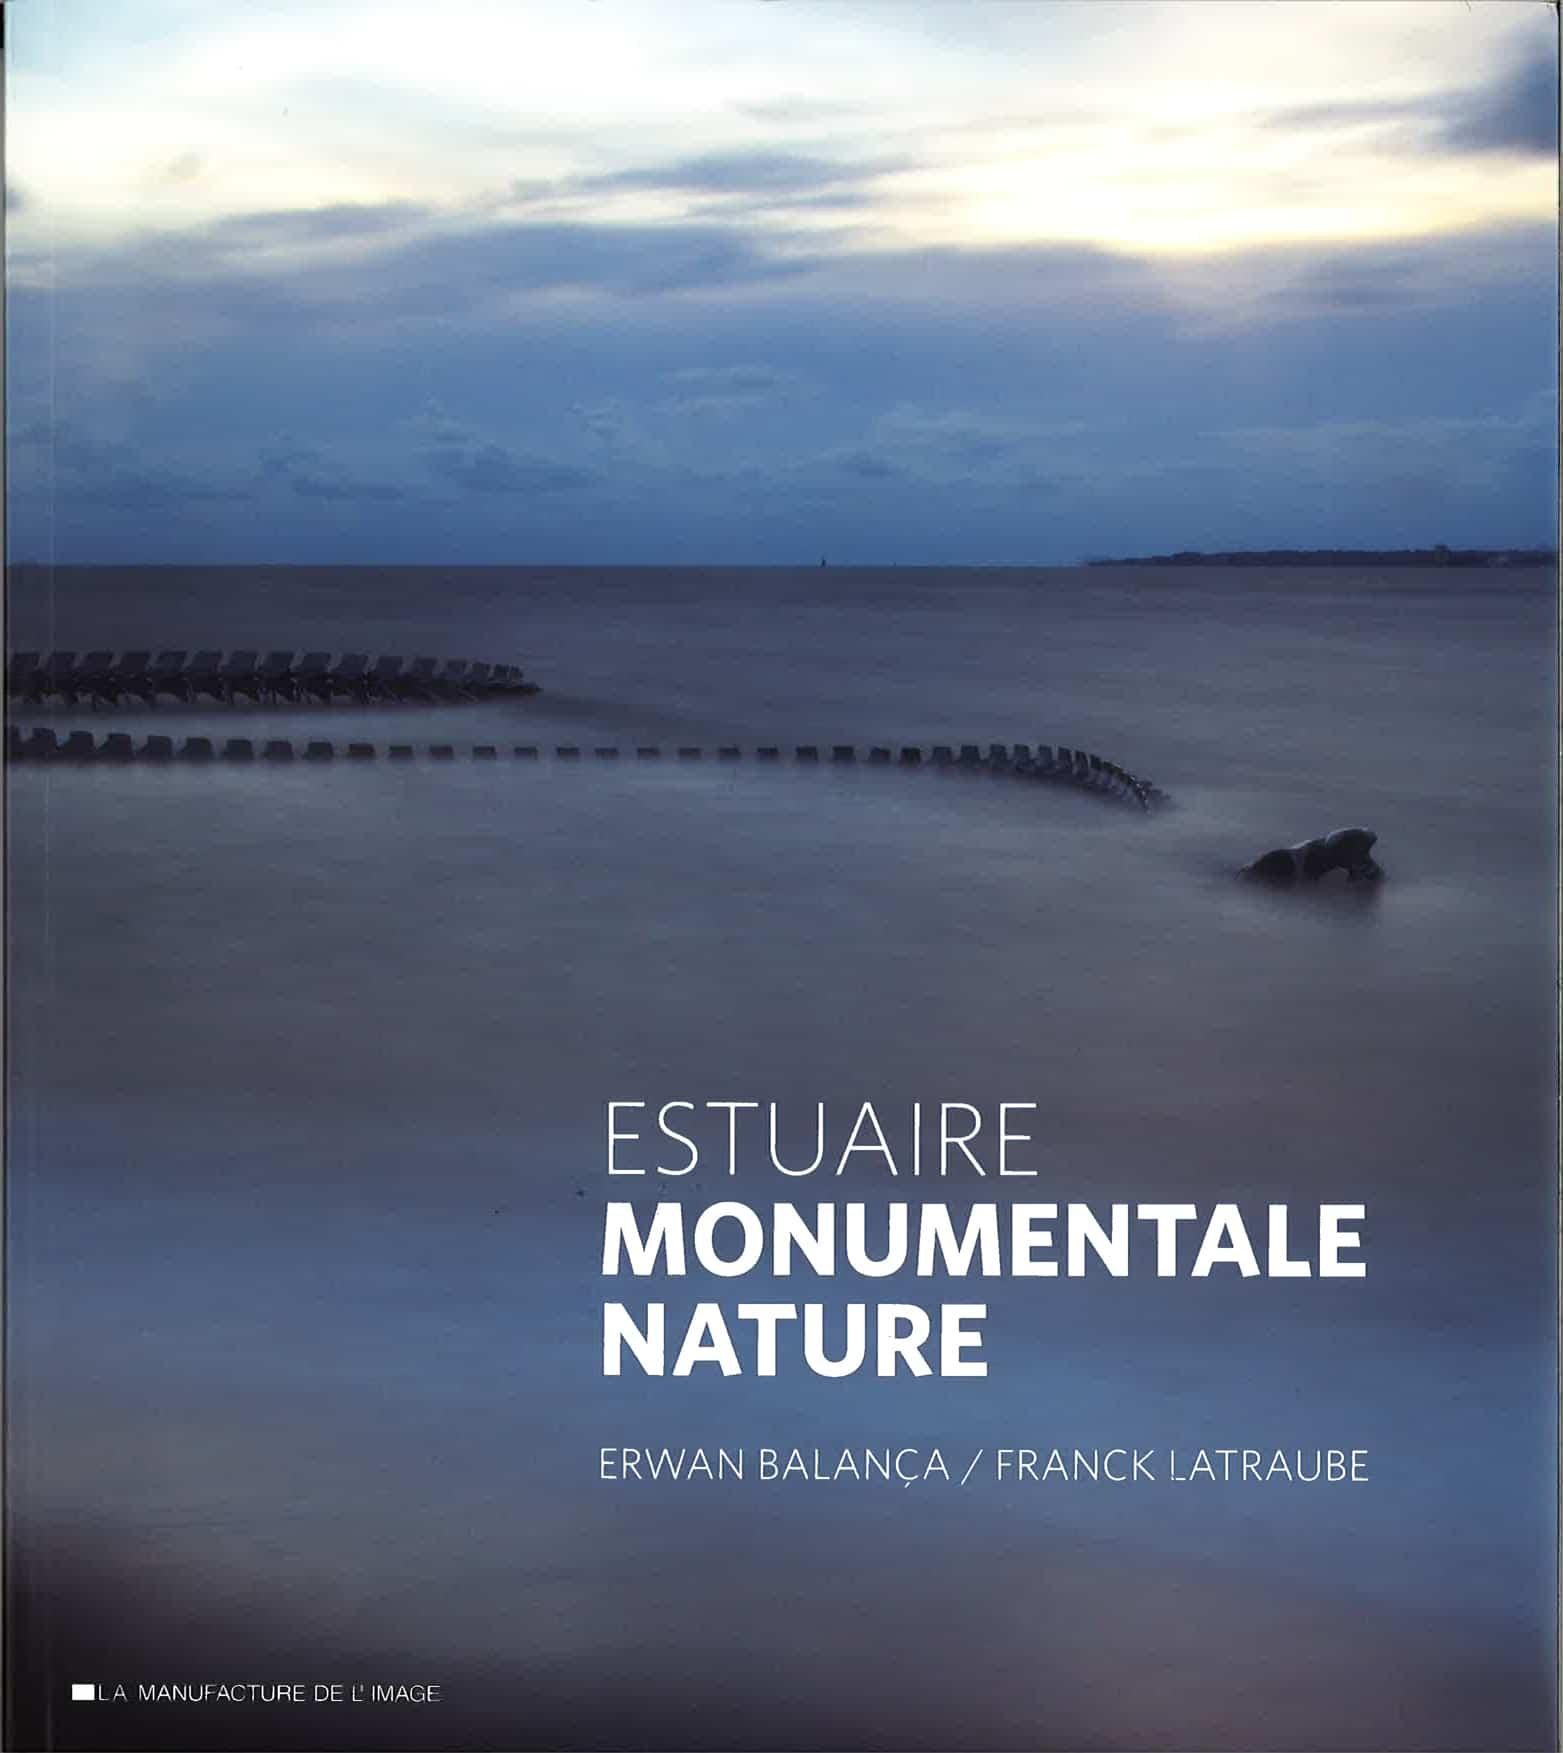 Estuaire – Monumentale nature